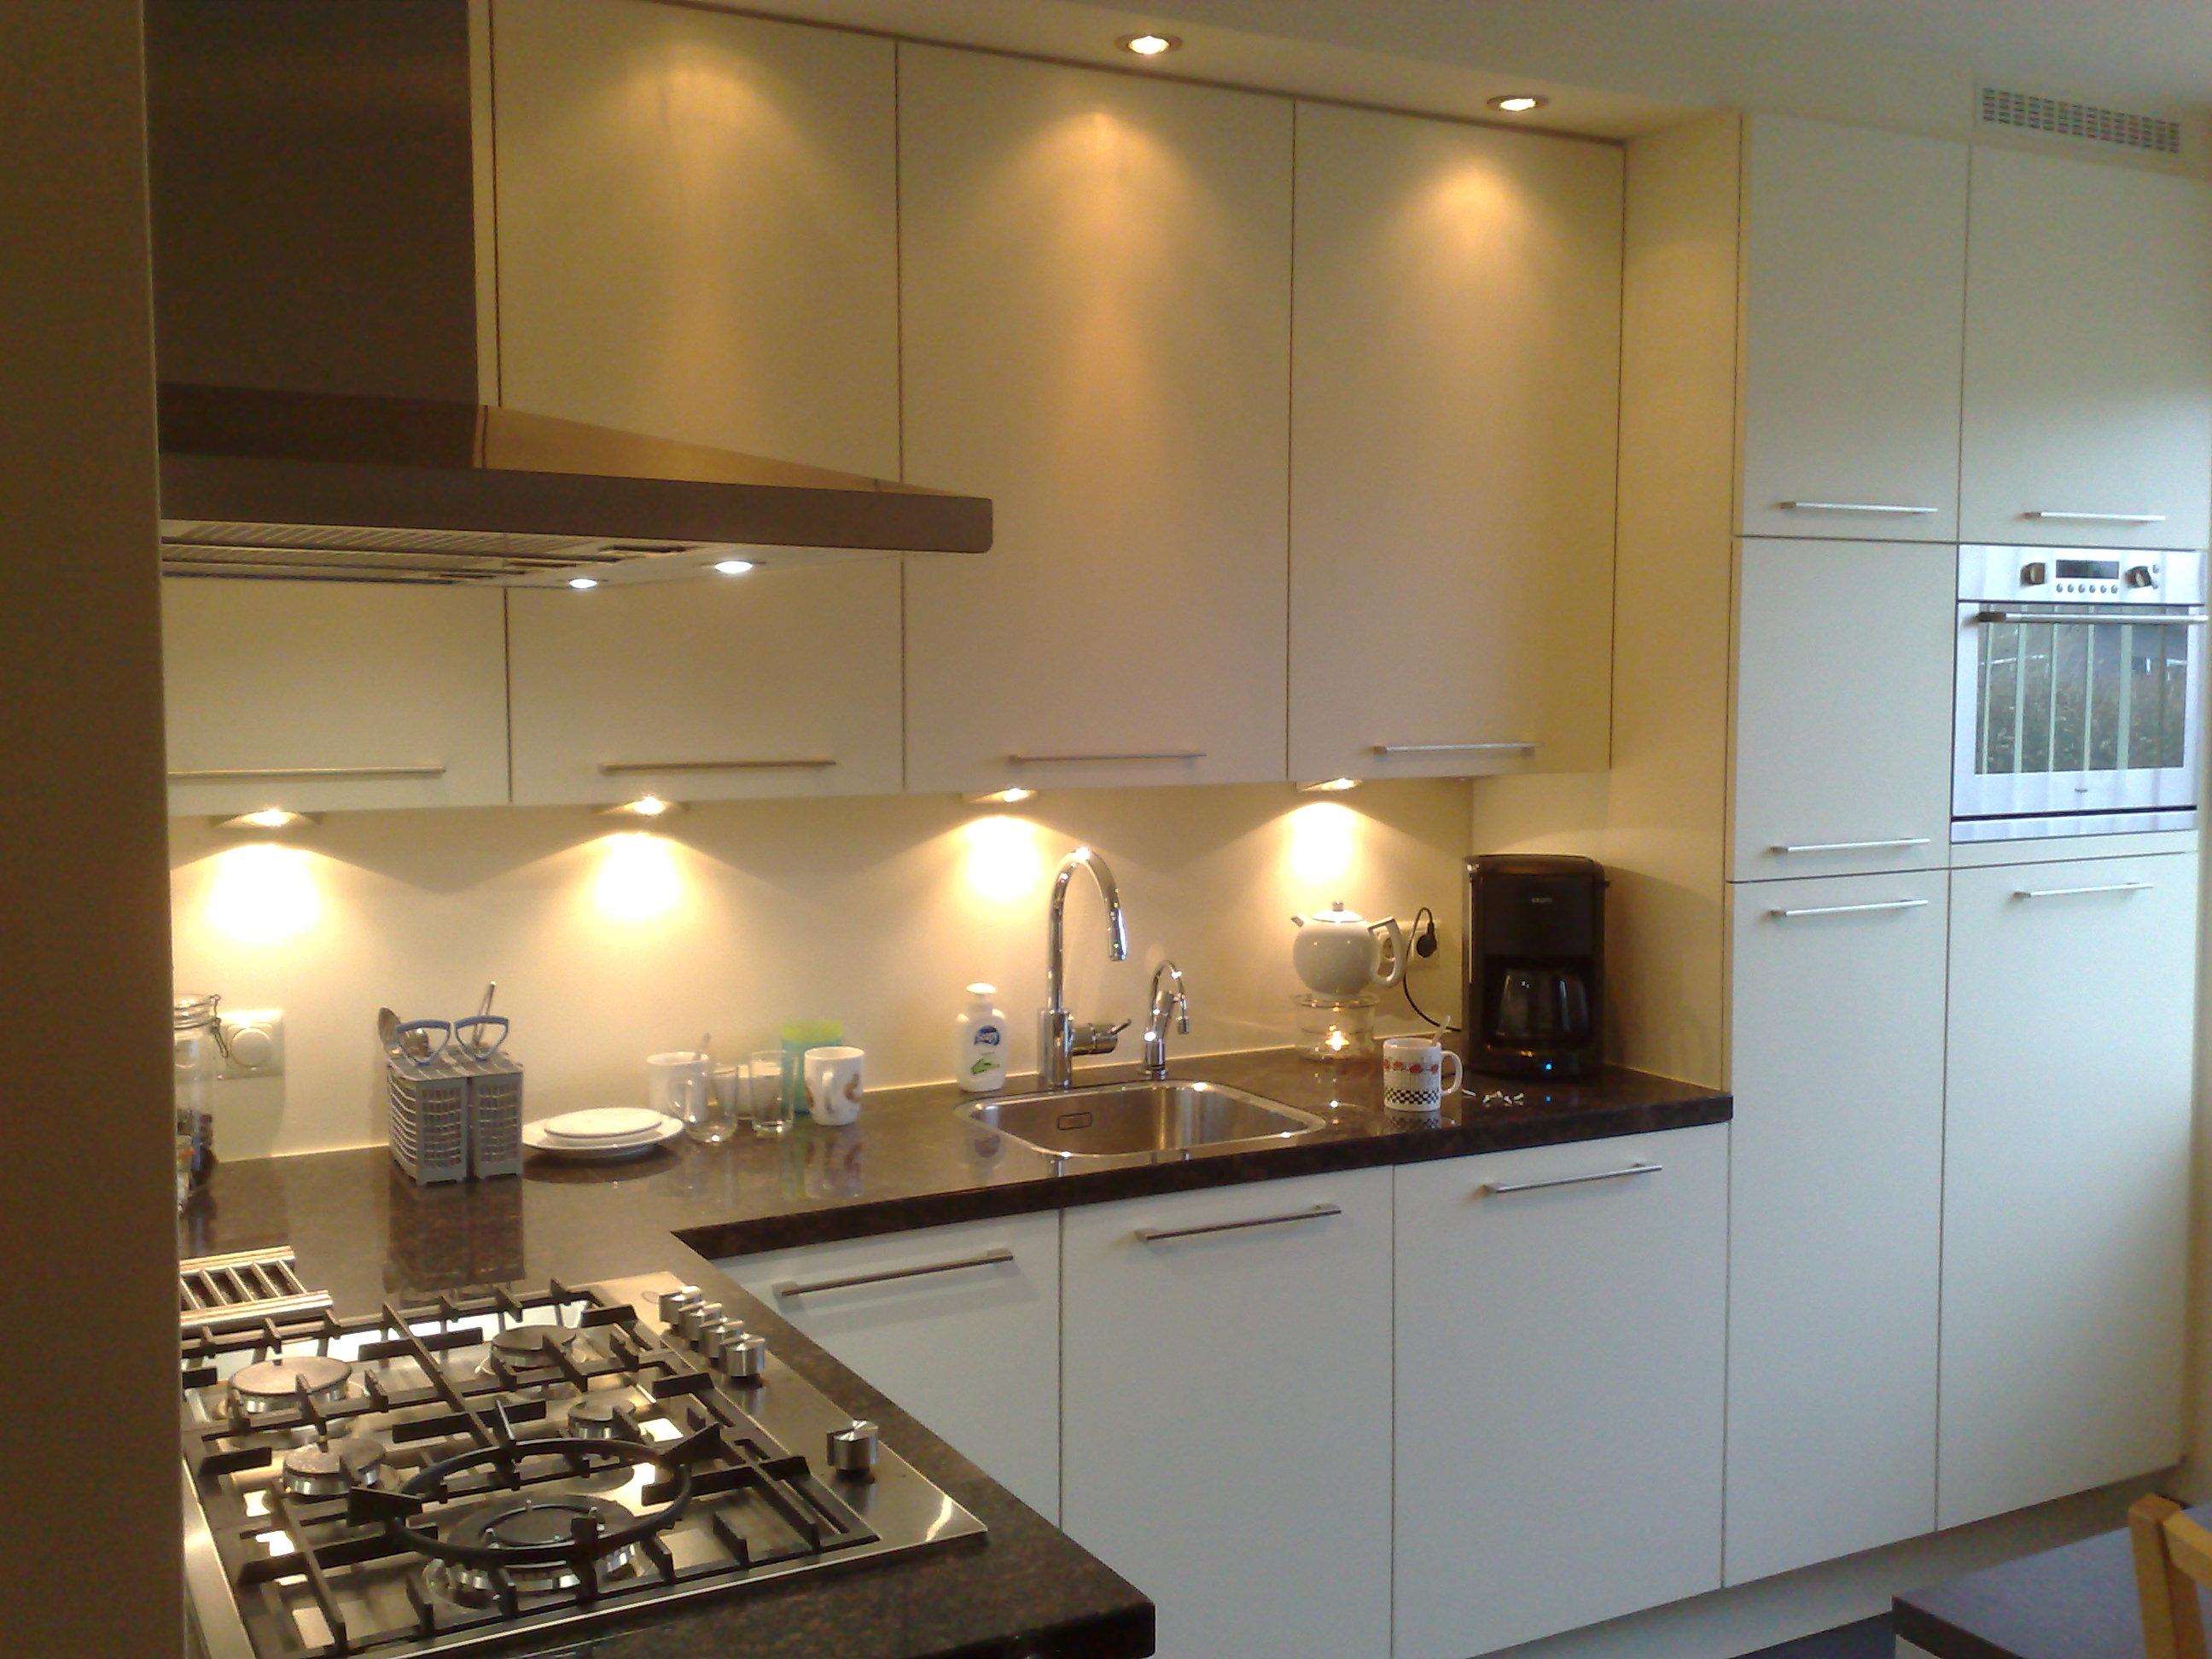 Keuken Ideeen Ikea : Posma Montagebedrijf – Keukenmontage-installatiebedrijf